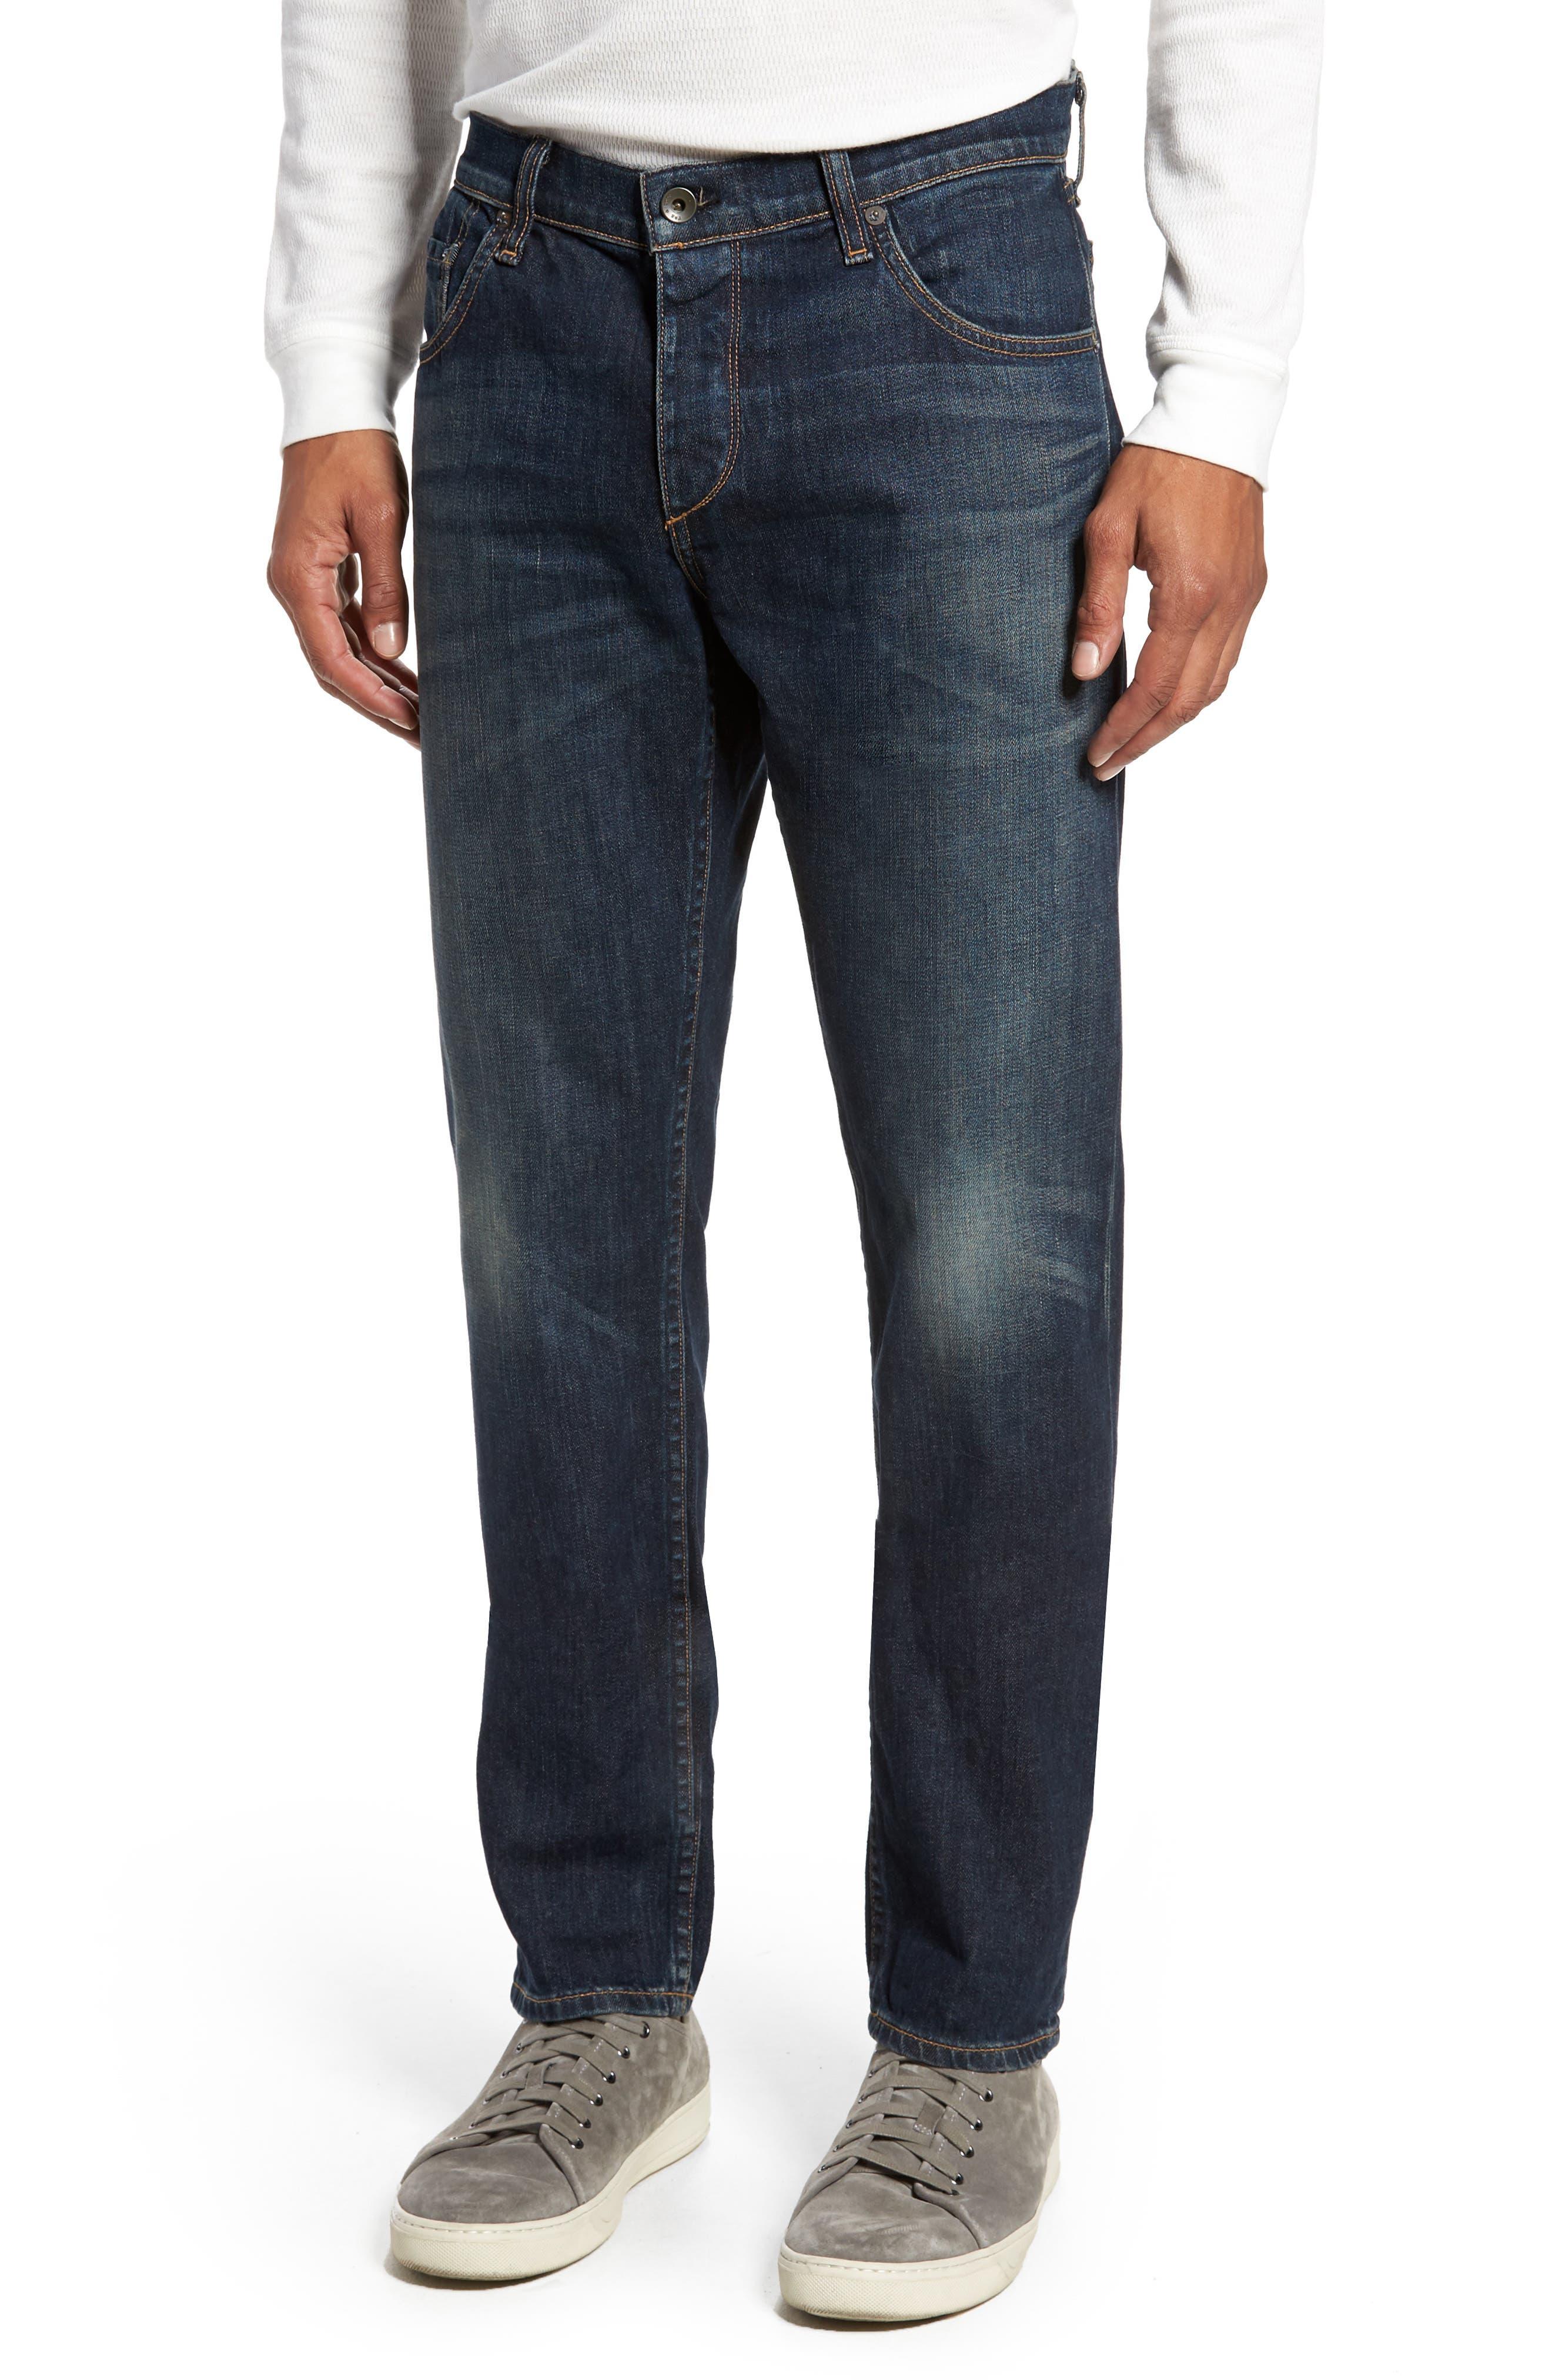 rag & bone Fit 2 Slim Fit Jeans (Knightsbridge)